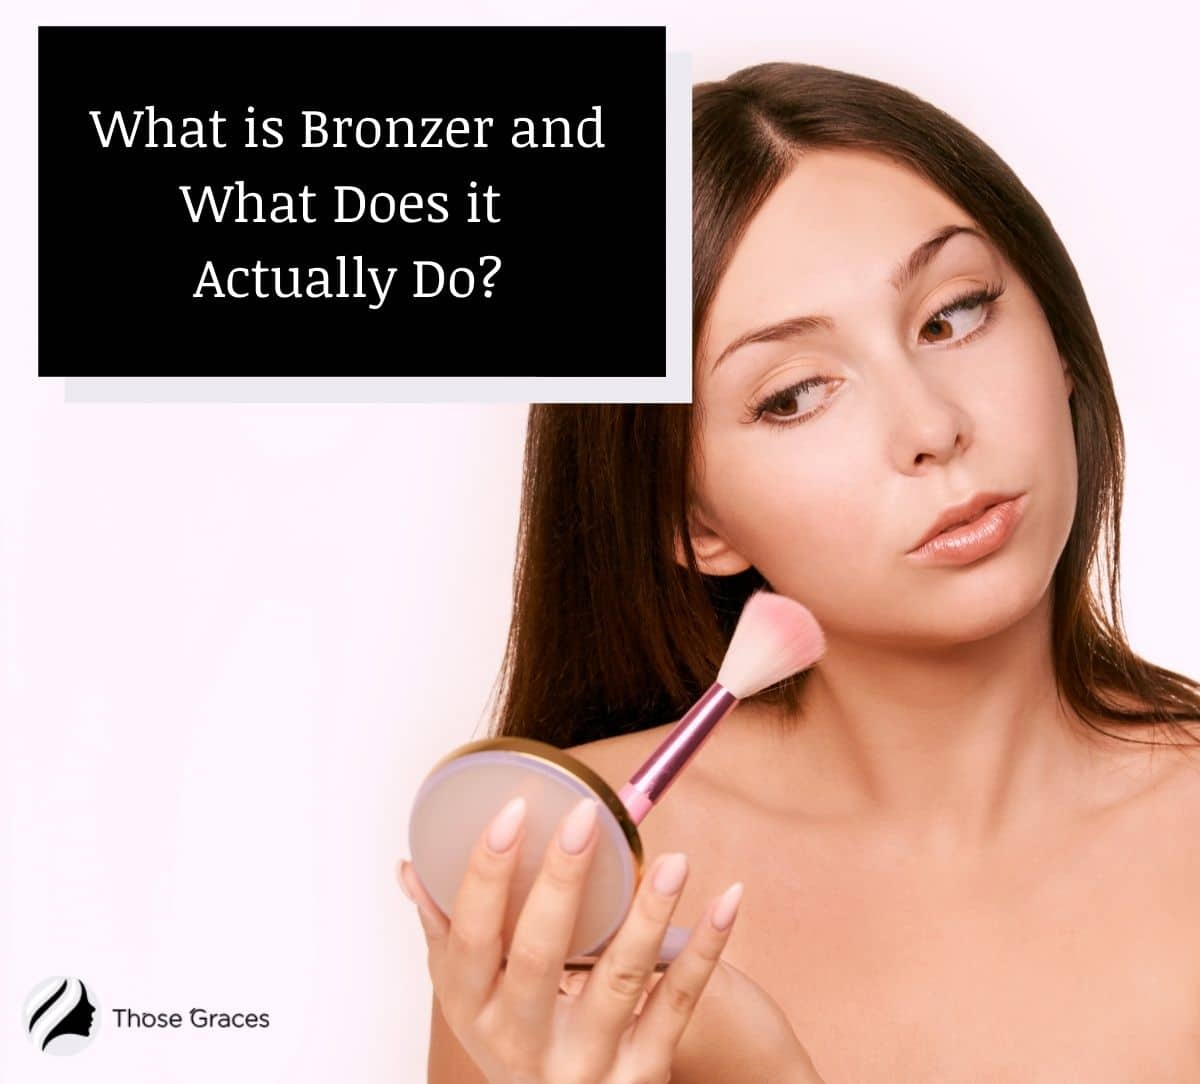 lady putting bronzer to her cheekbones but what is bronzer?